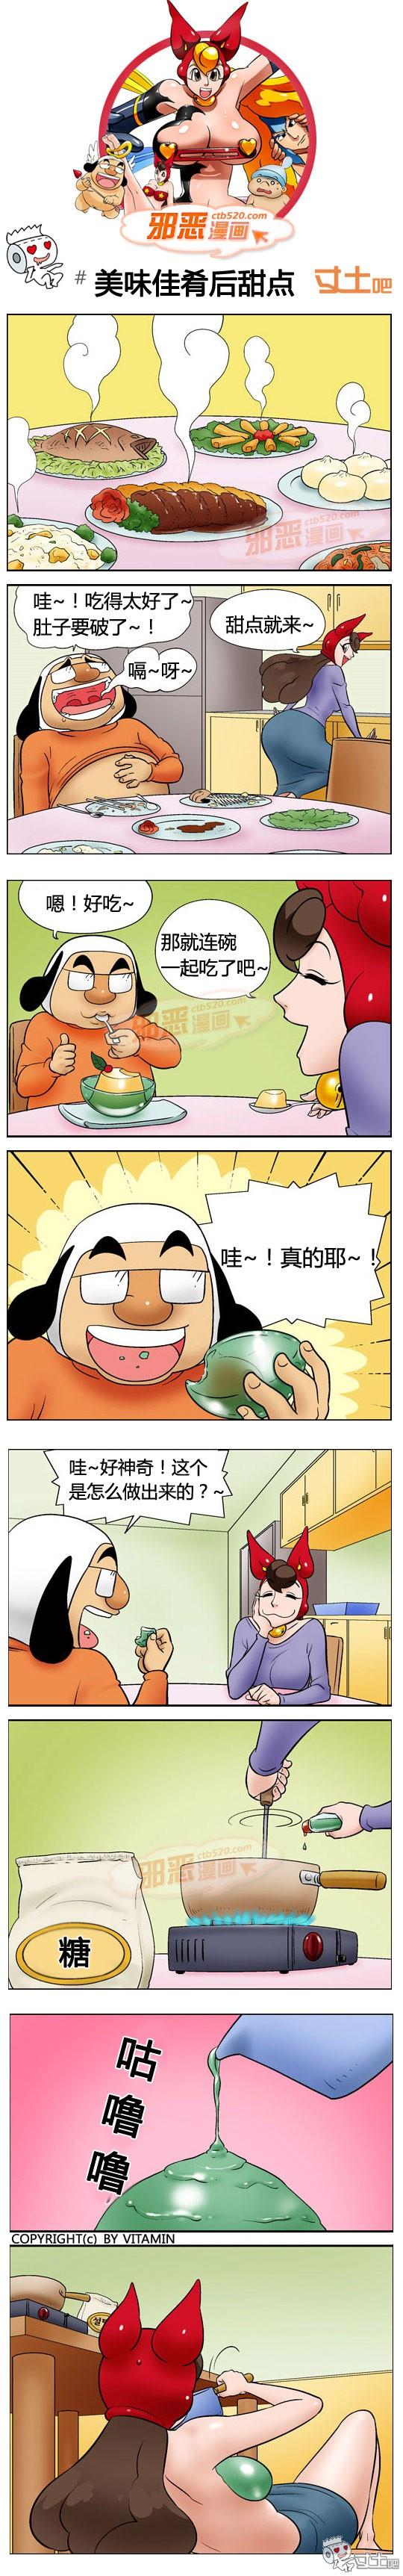 www.xieman5.com_邪恶漫画美味佳肴后甜点